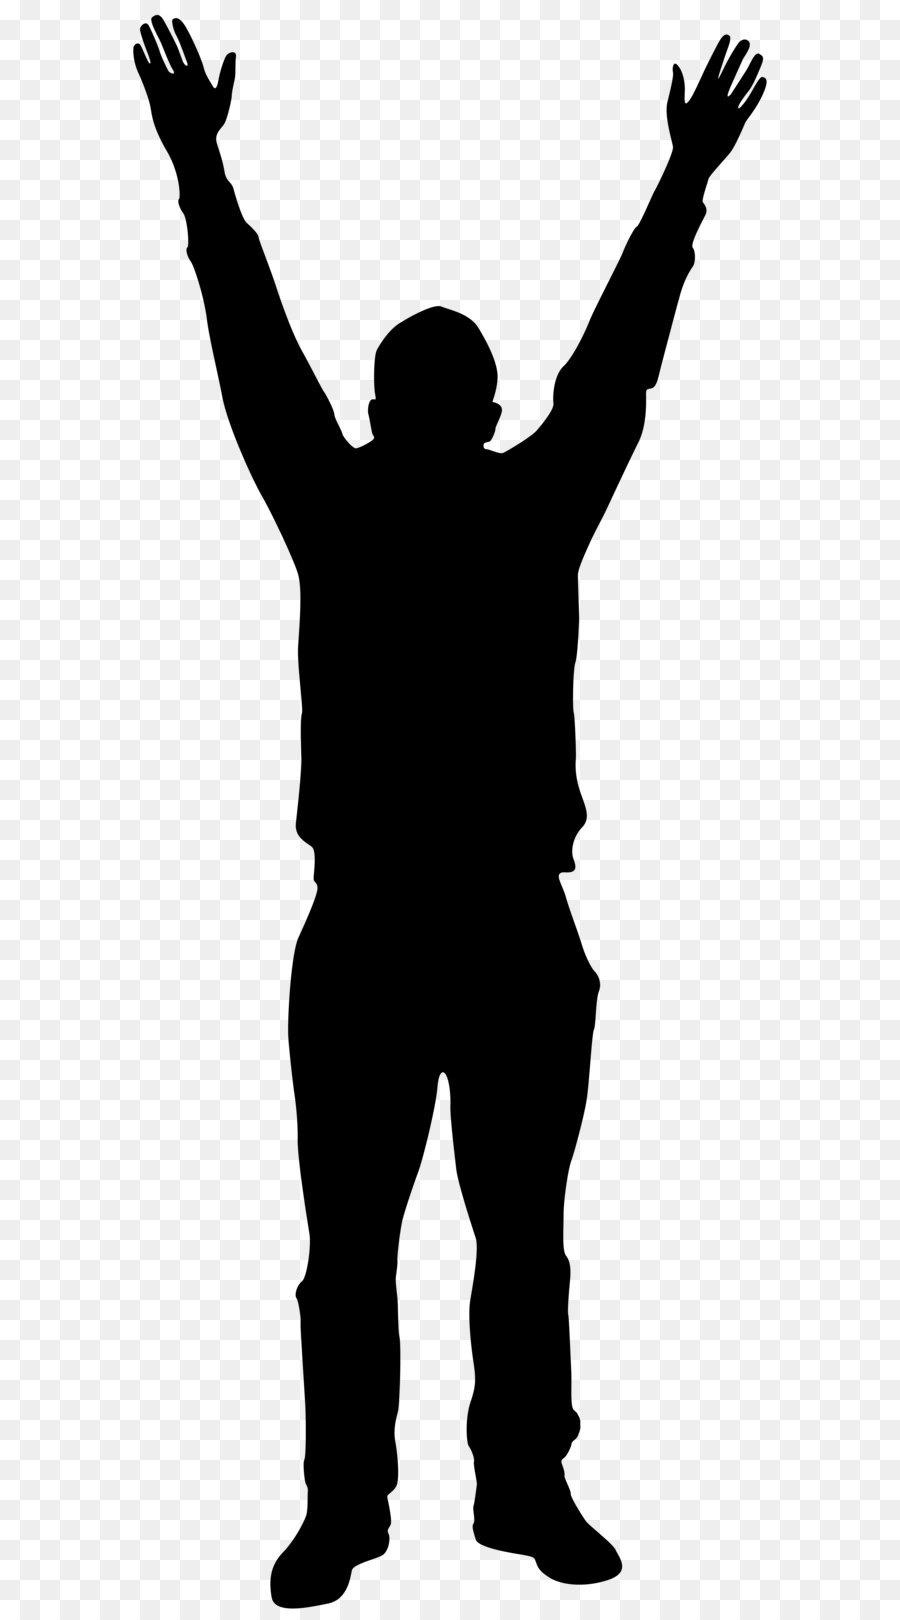 hight resolution of 900x1620 silhouette man clip art